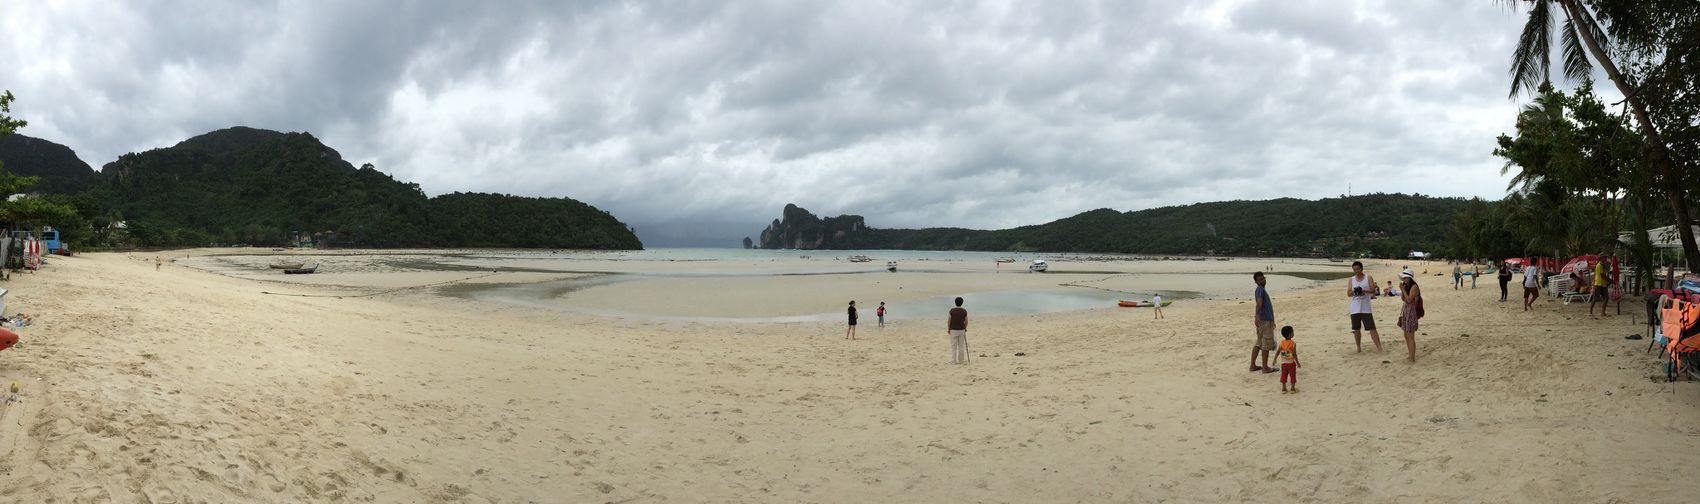 Beach Traveling Thailand Enjoying Life